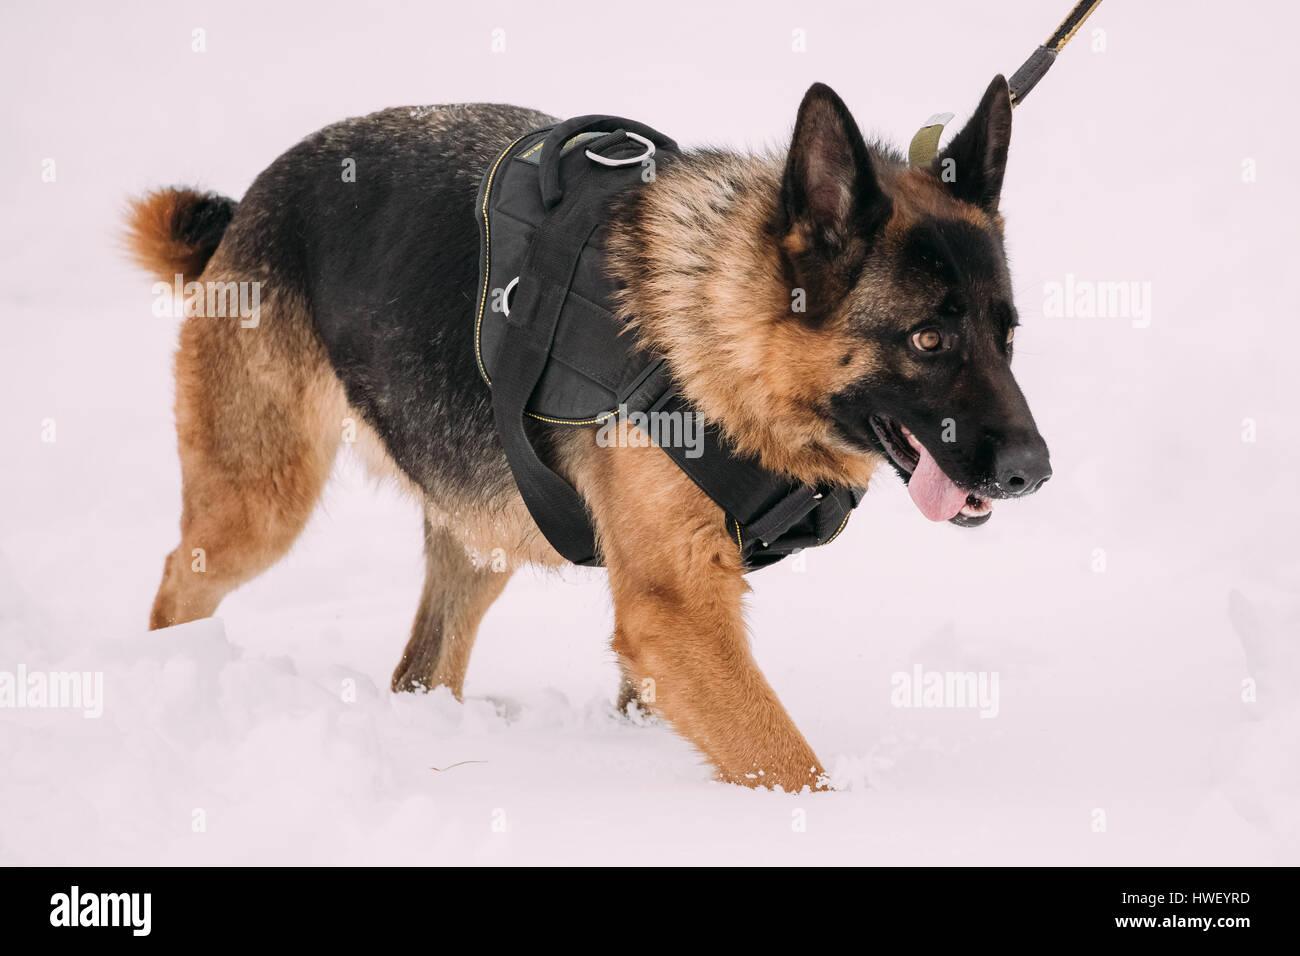 German Shepherd Dog Walking During Training. Winter Season. Training Of Purebred Adult Alsatian Wolf Dog - Stock Image